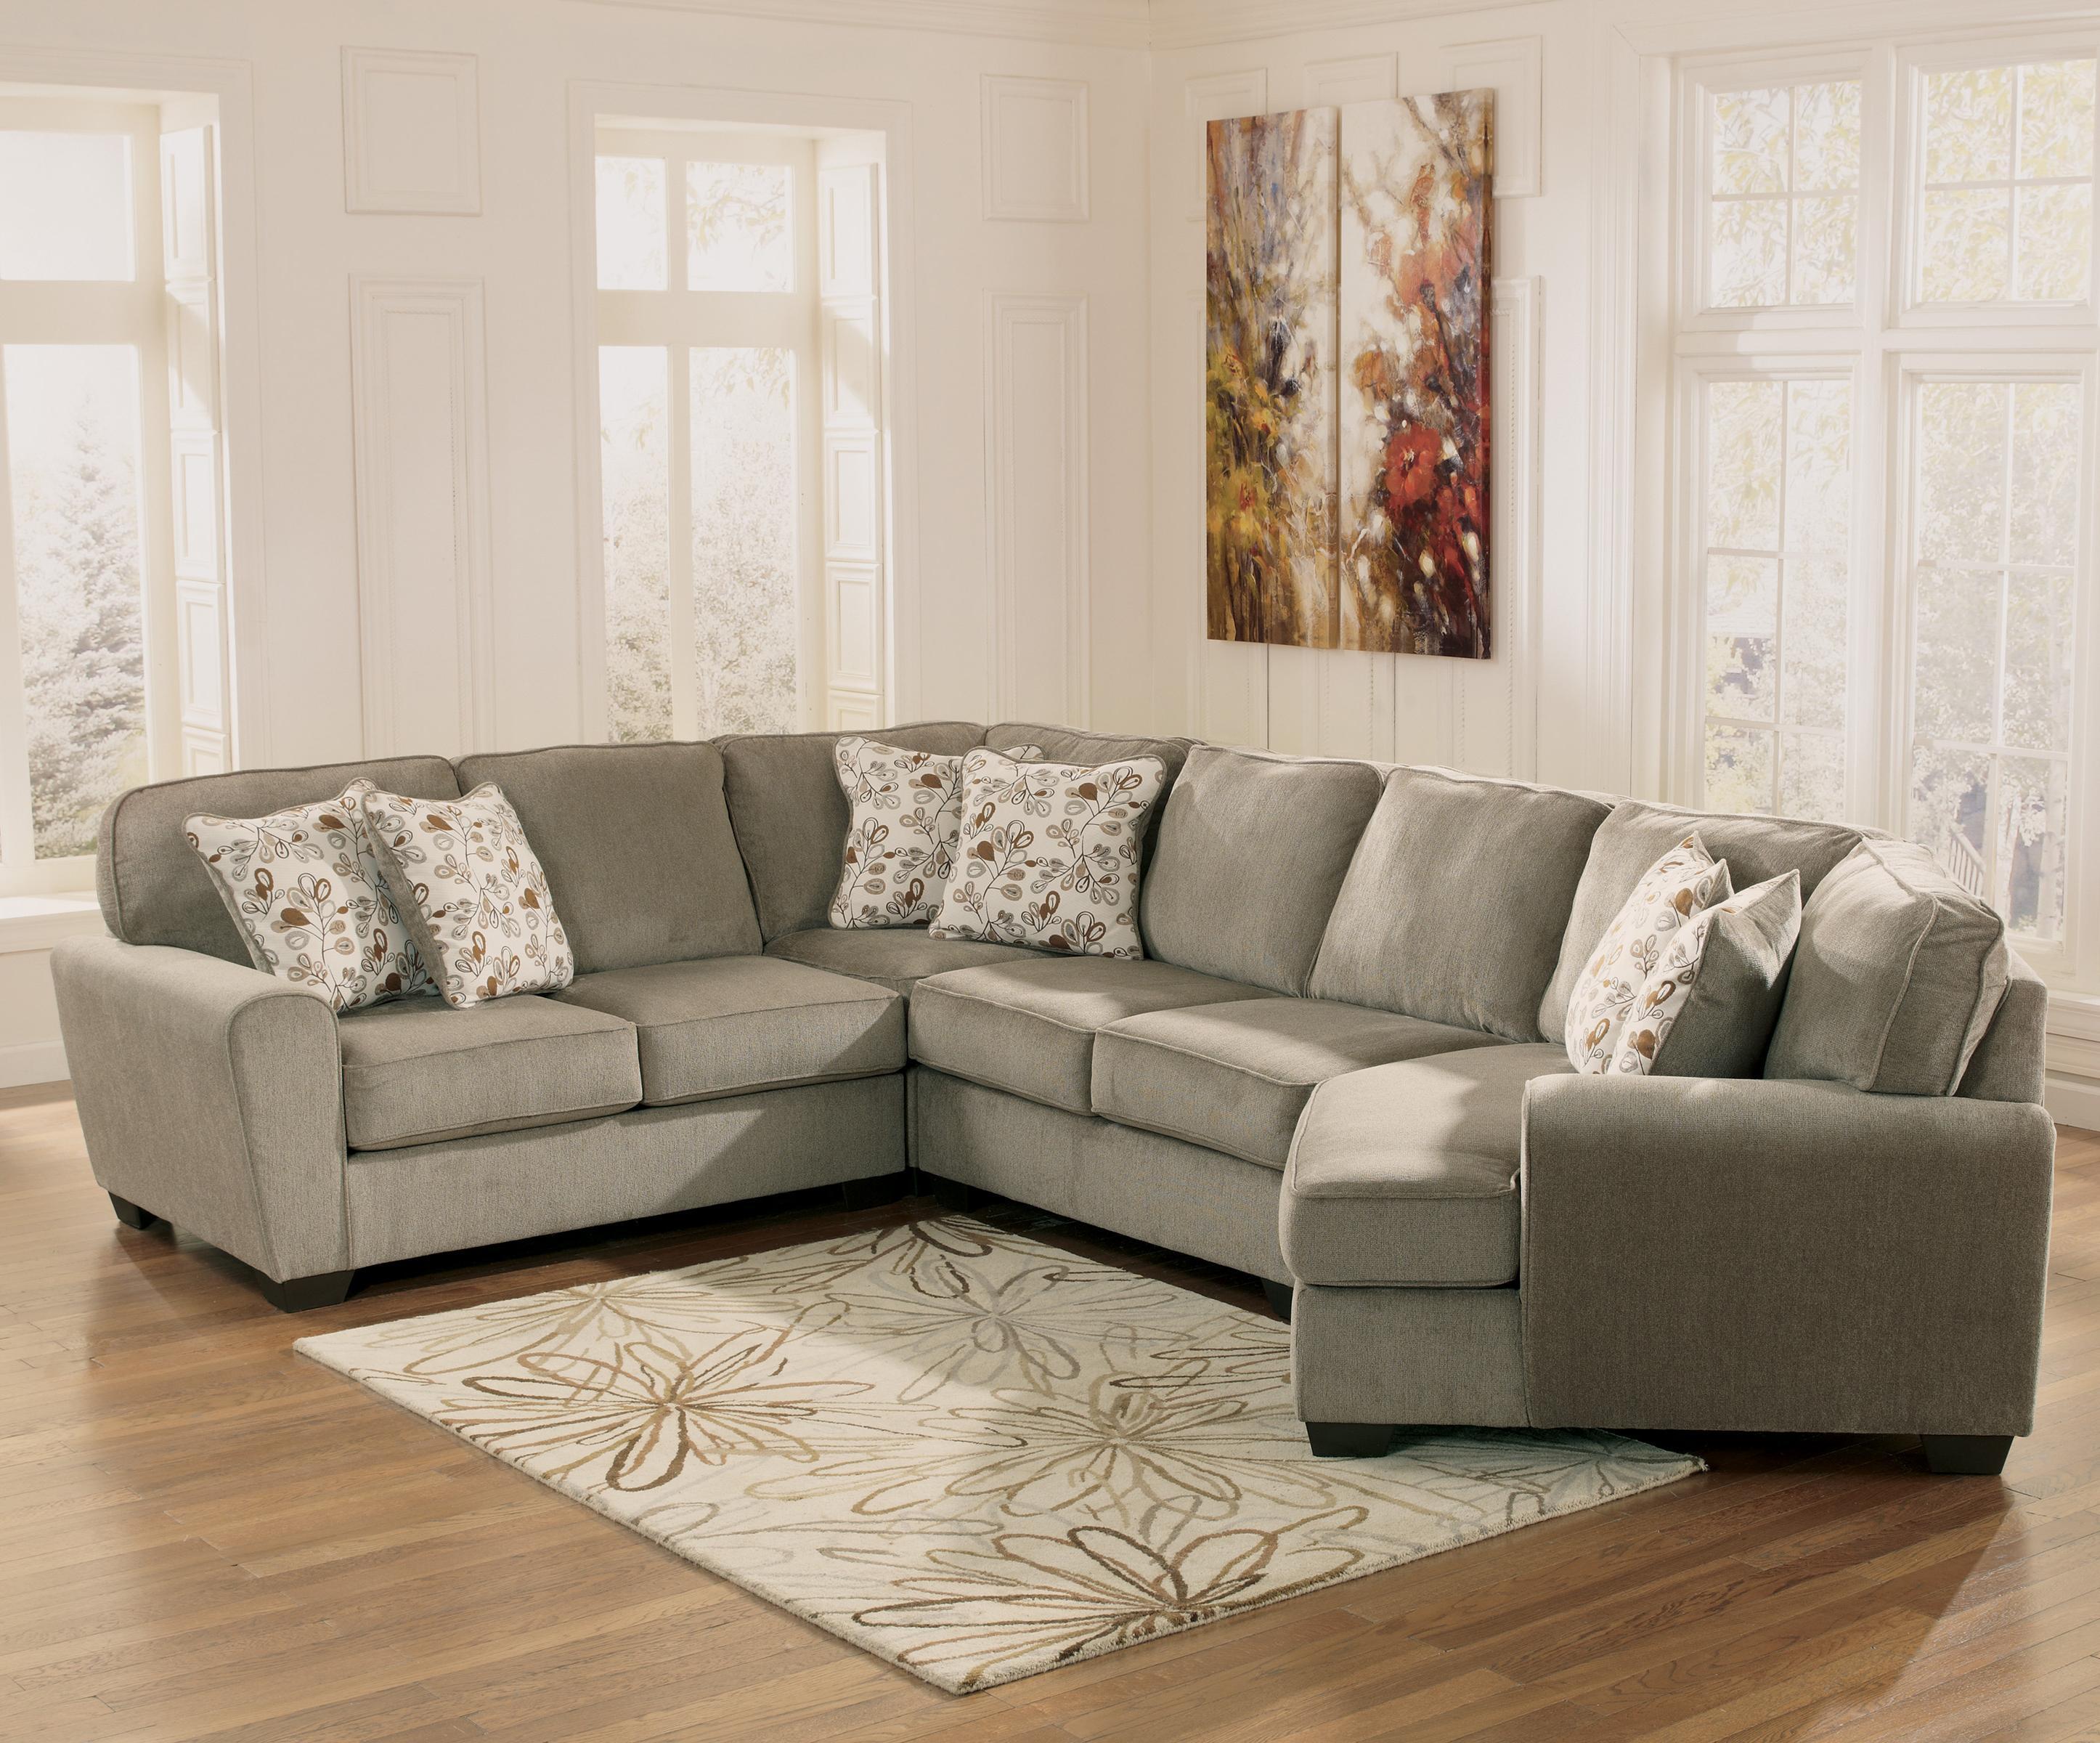 Ashley Furniture Patola Park